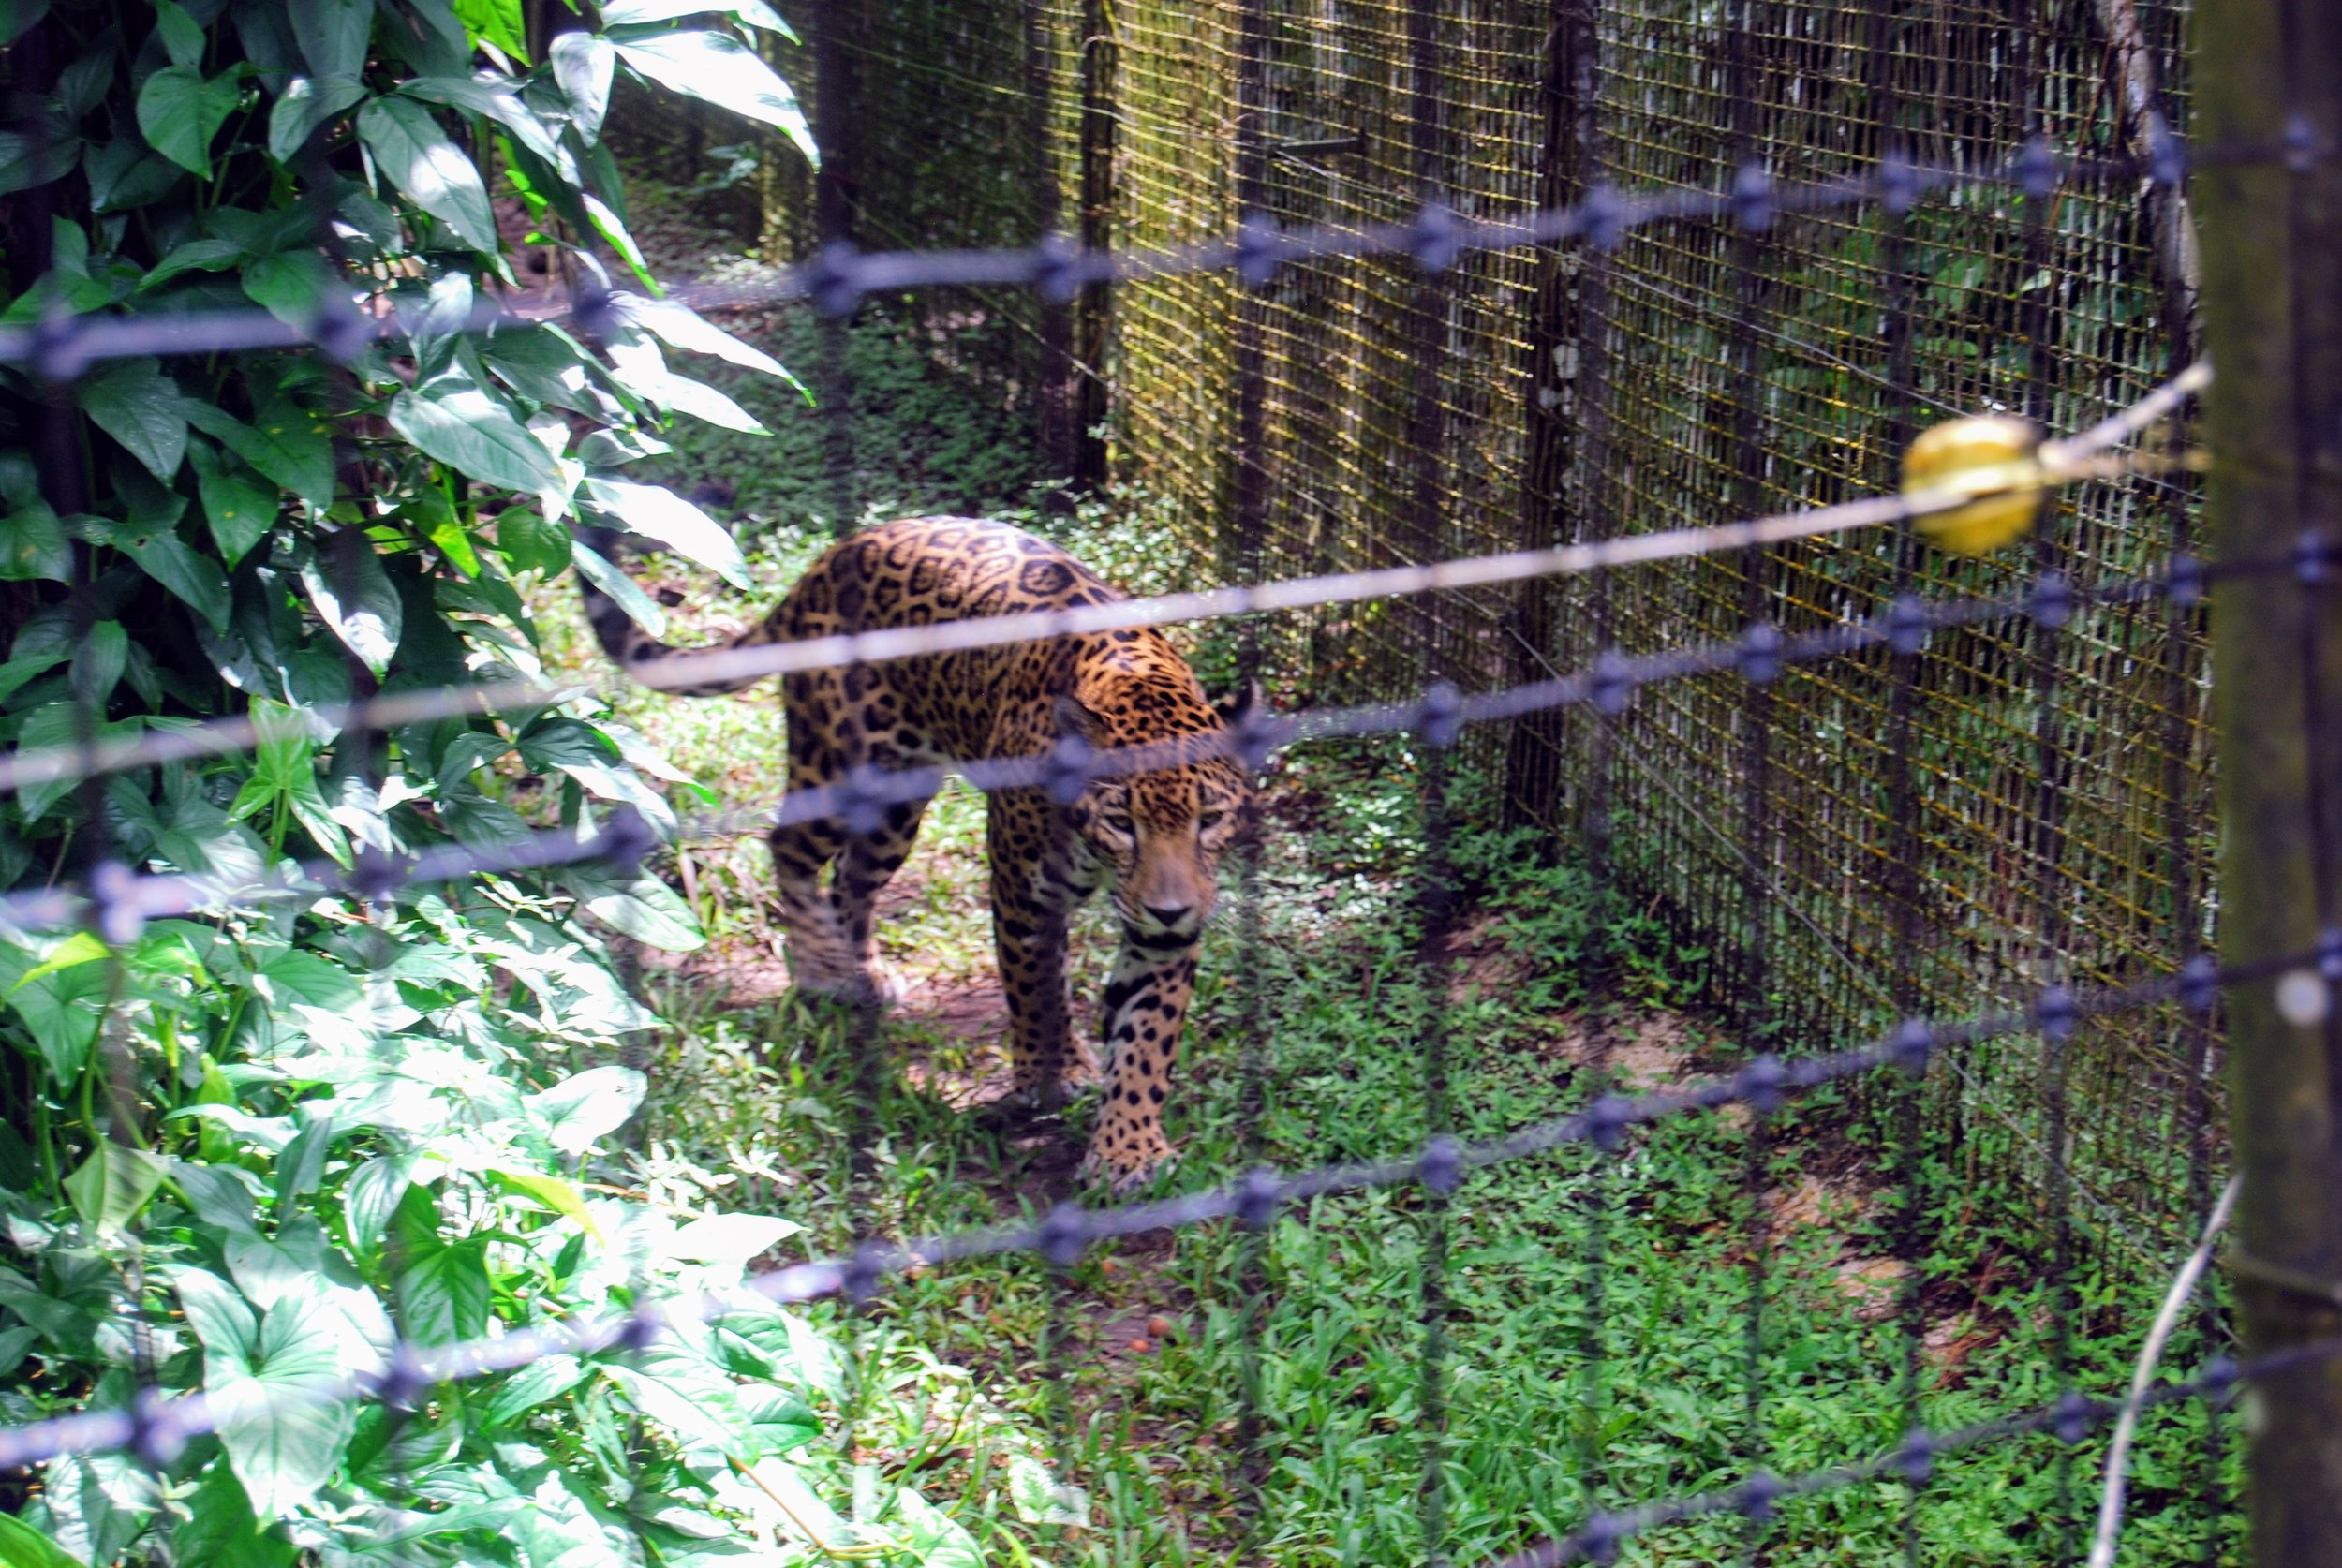 Jaguar pacing the fence